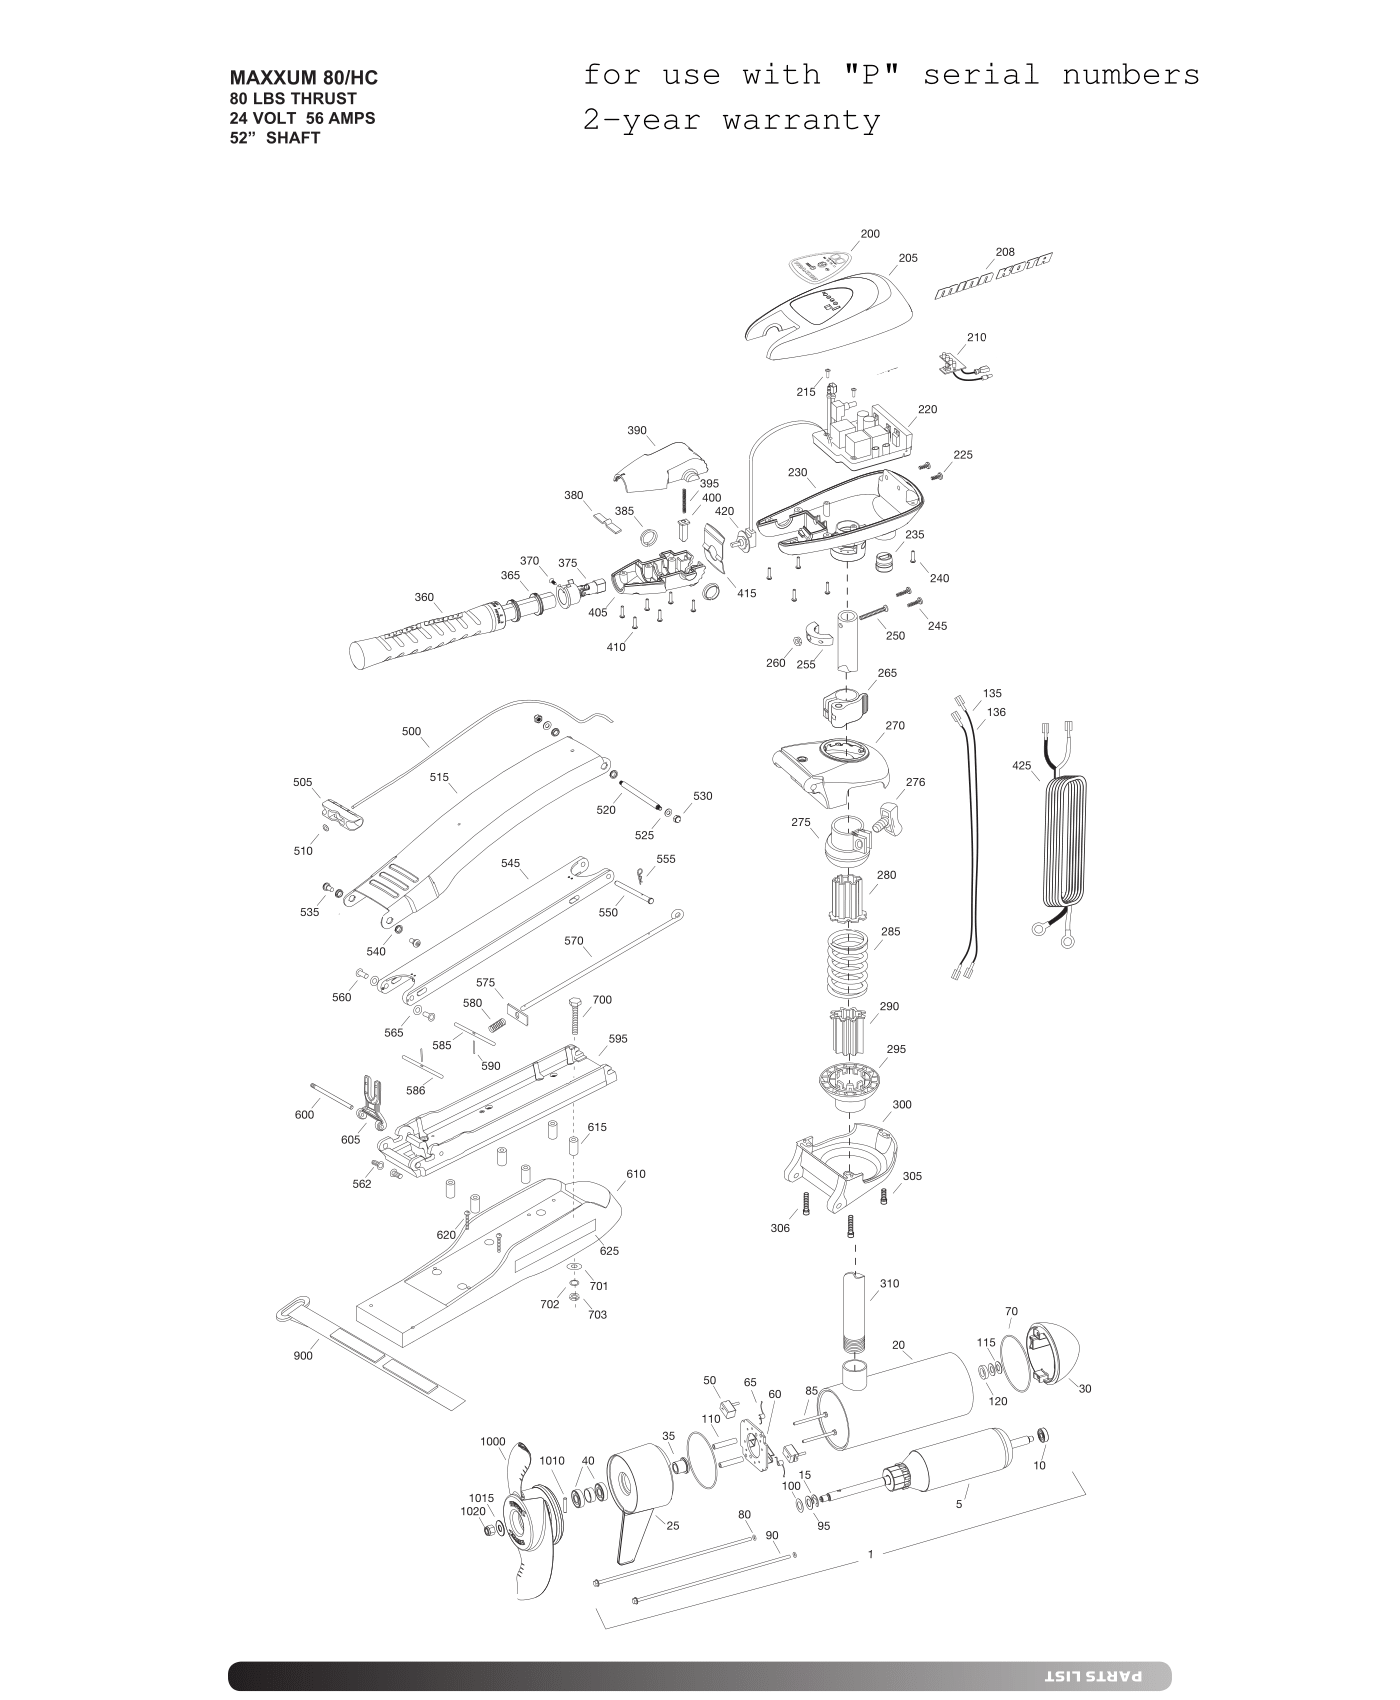 2015-mk-max80handcontrol-1.png